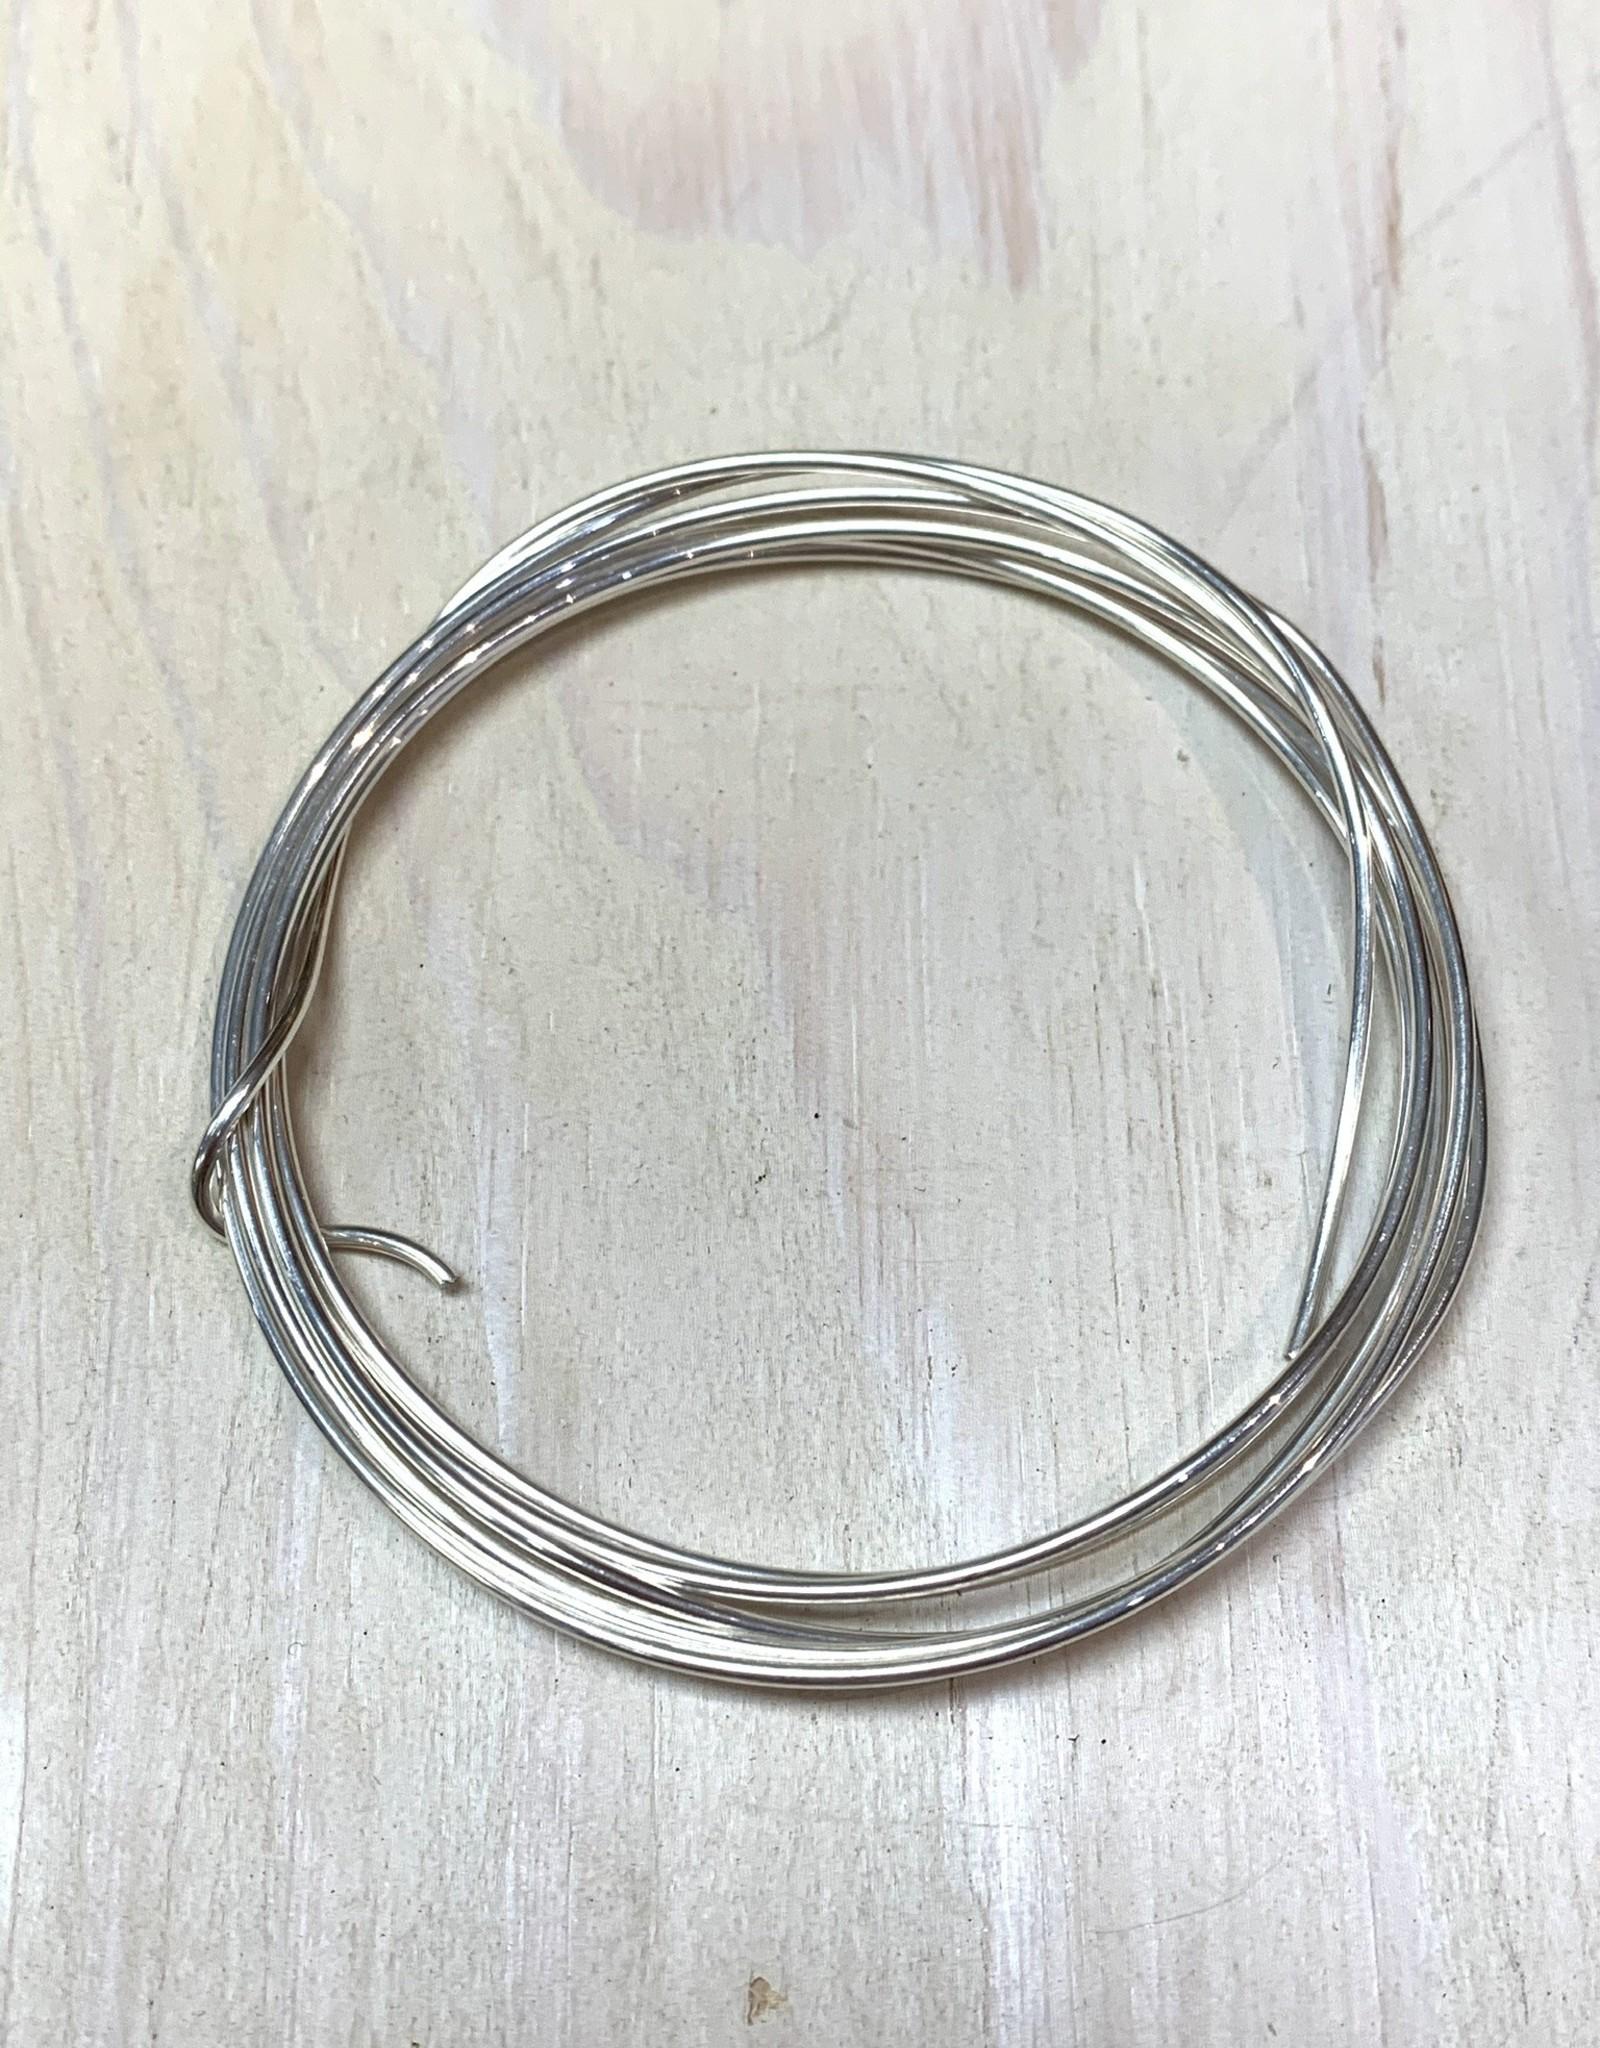 16ga Round Wire Sterling Silver 1/2oz DS